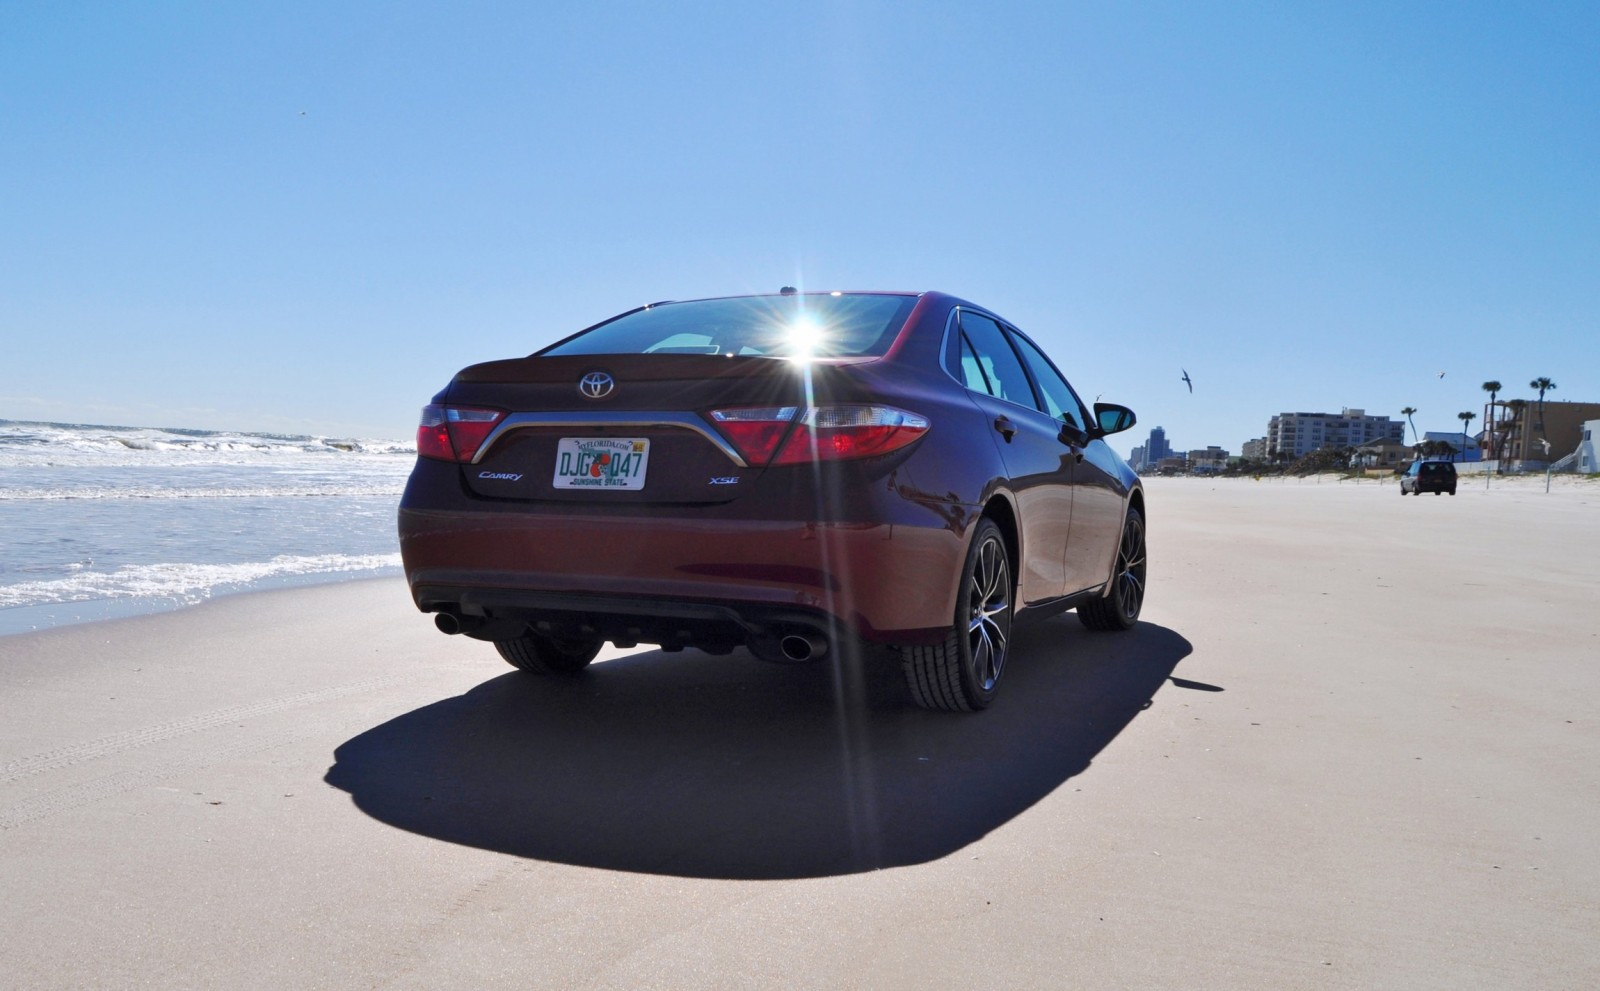 2015 Toyota Camry NASCAR Daytona Beach 65